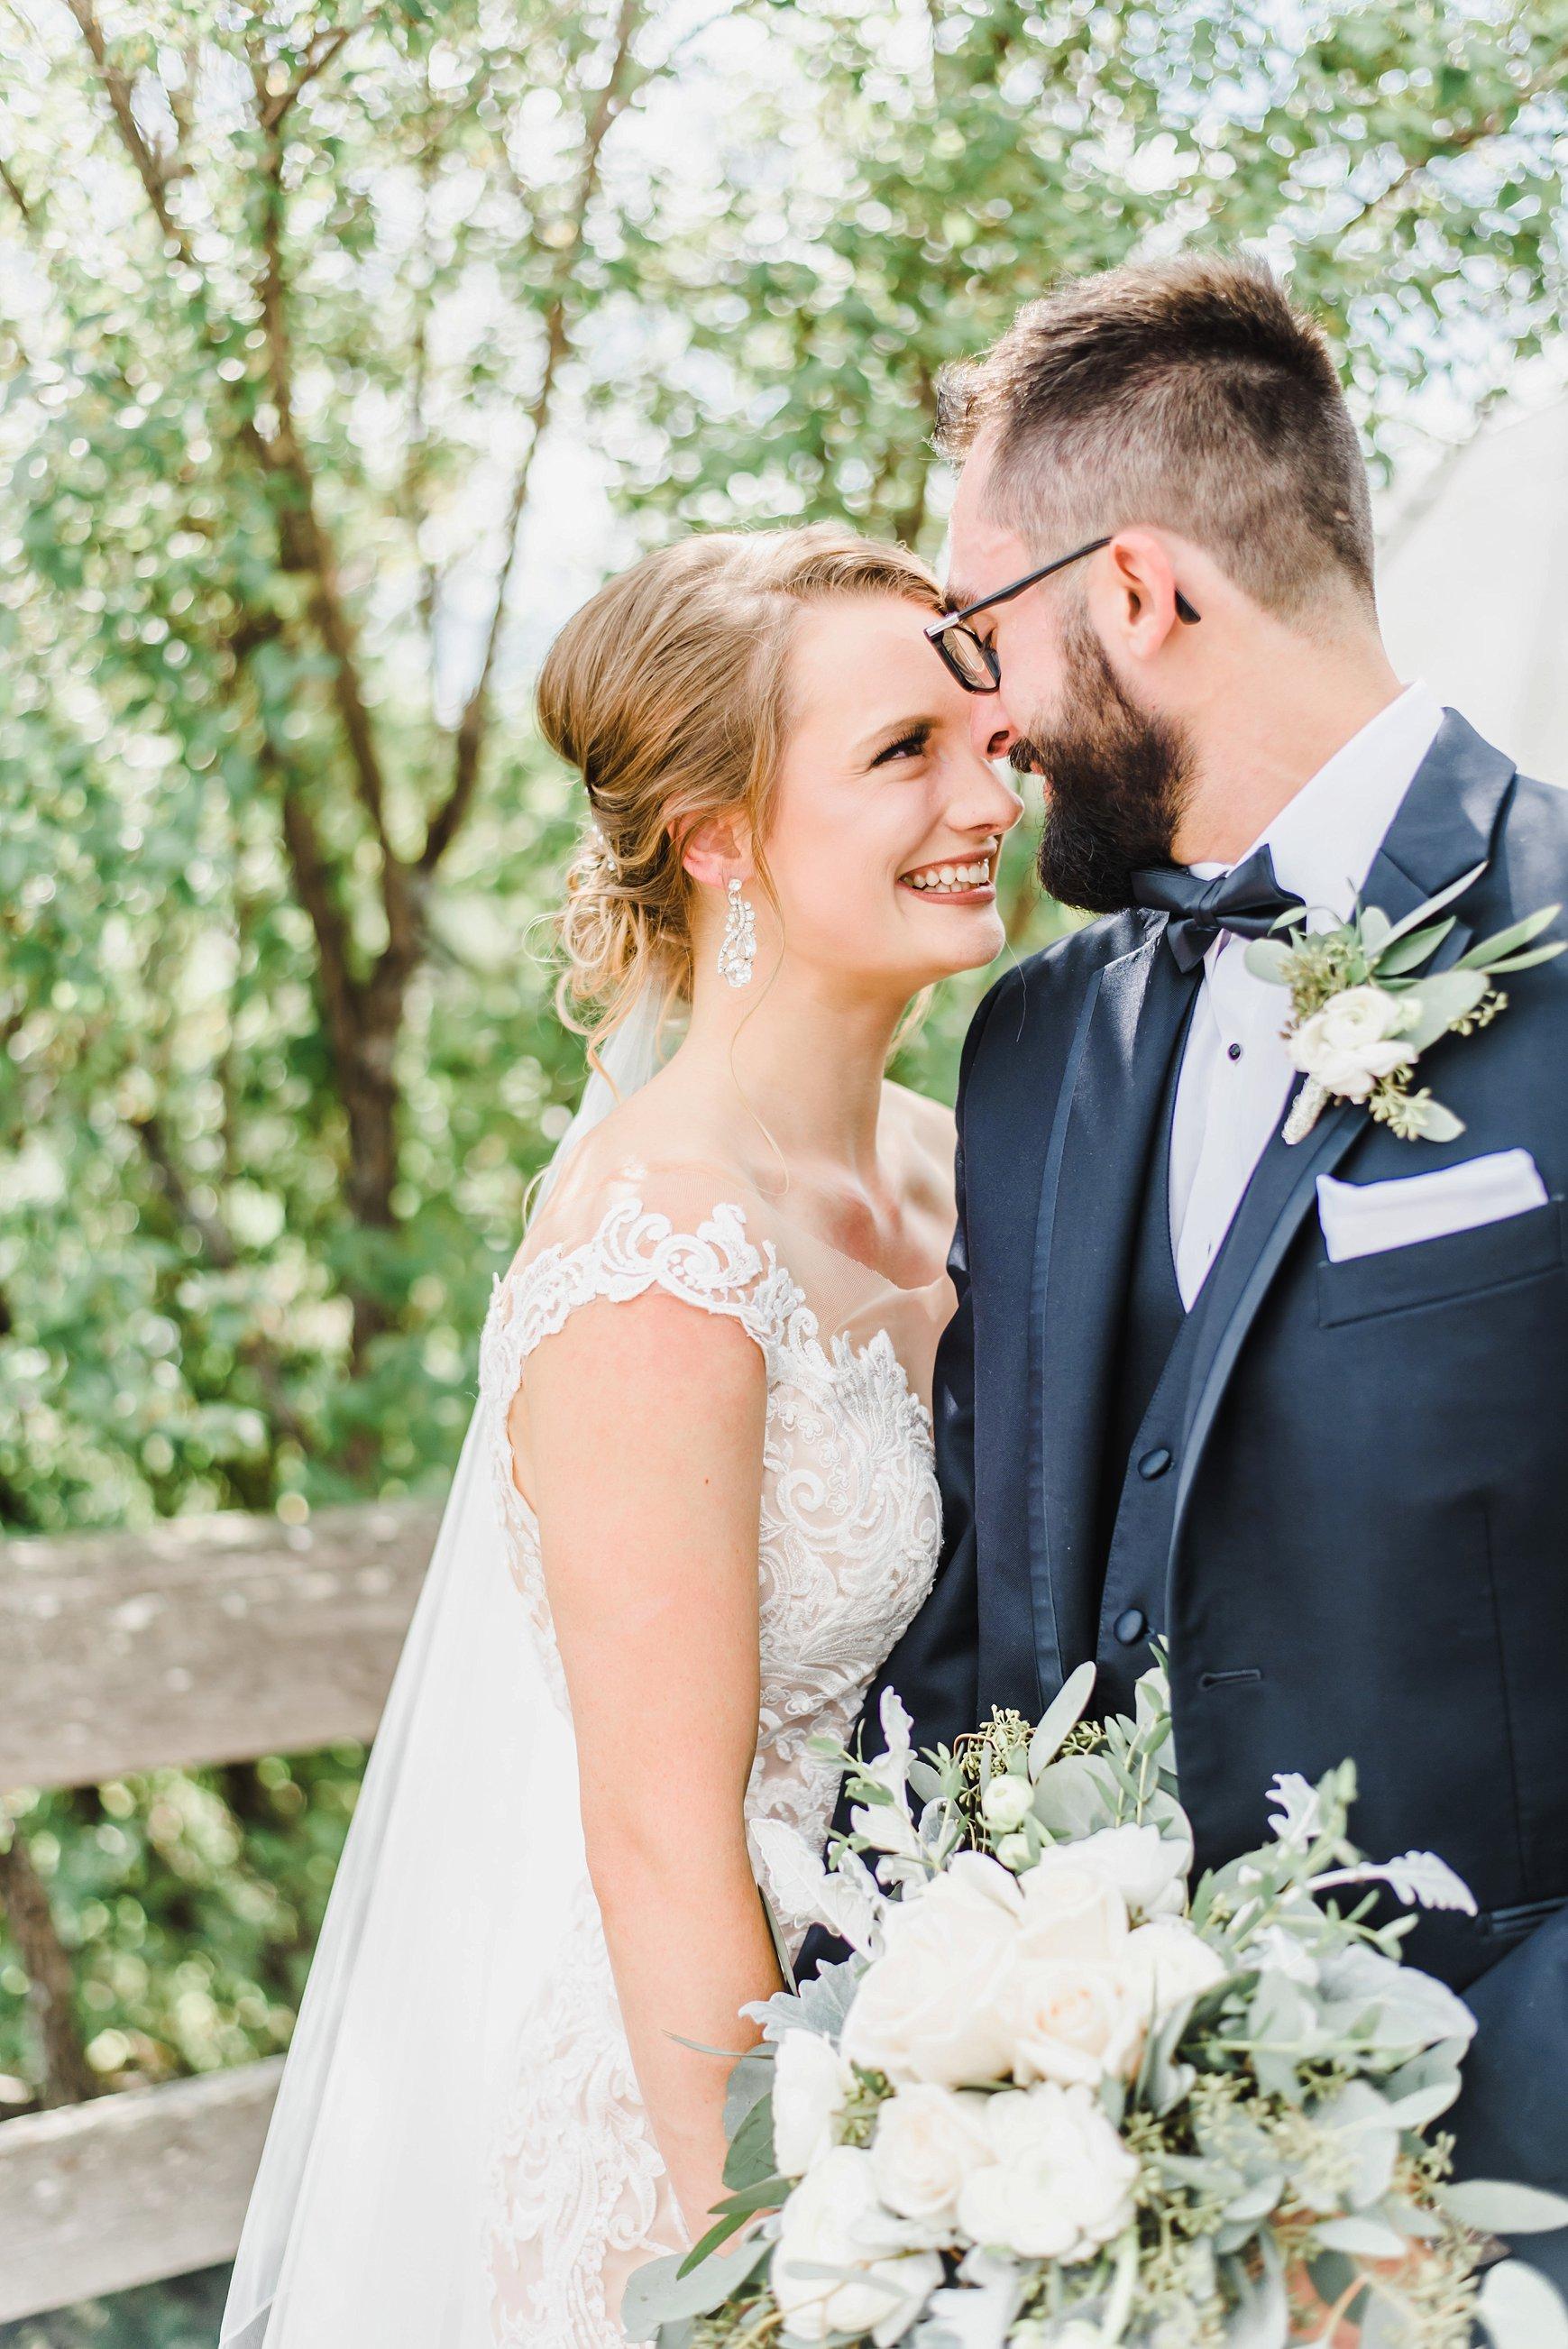 light airy indie fine art ottawa wedding photographer | Ali and Batoul Photography_1257.jpg